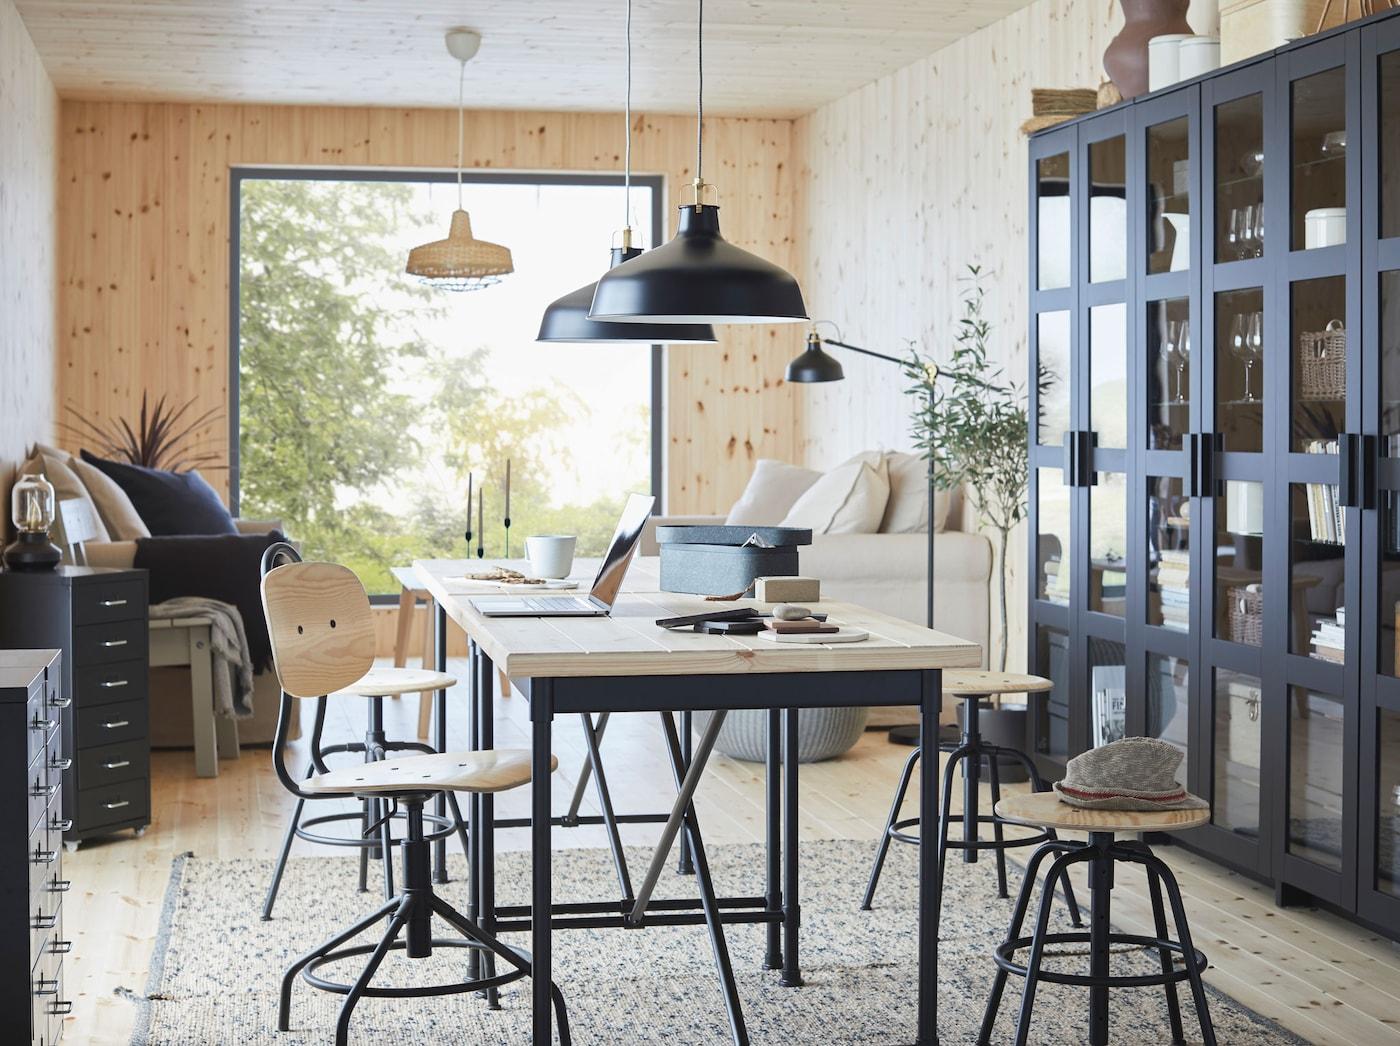 Ikea bureau professionnel frais bureau professionnel ikea frais